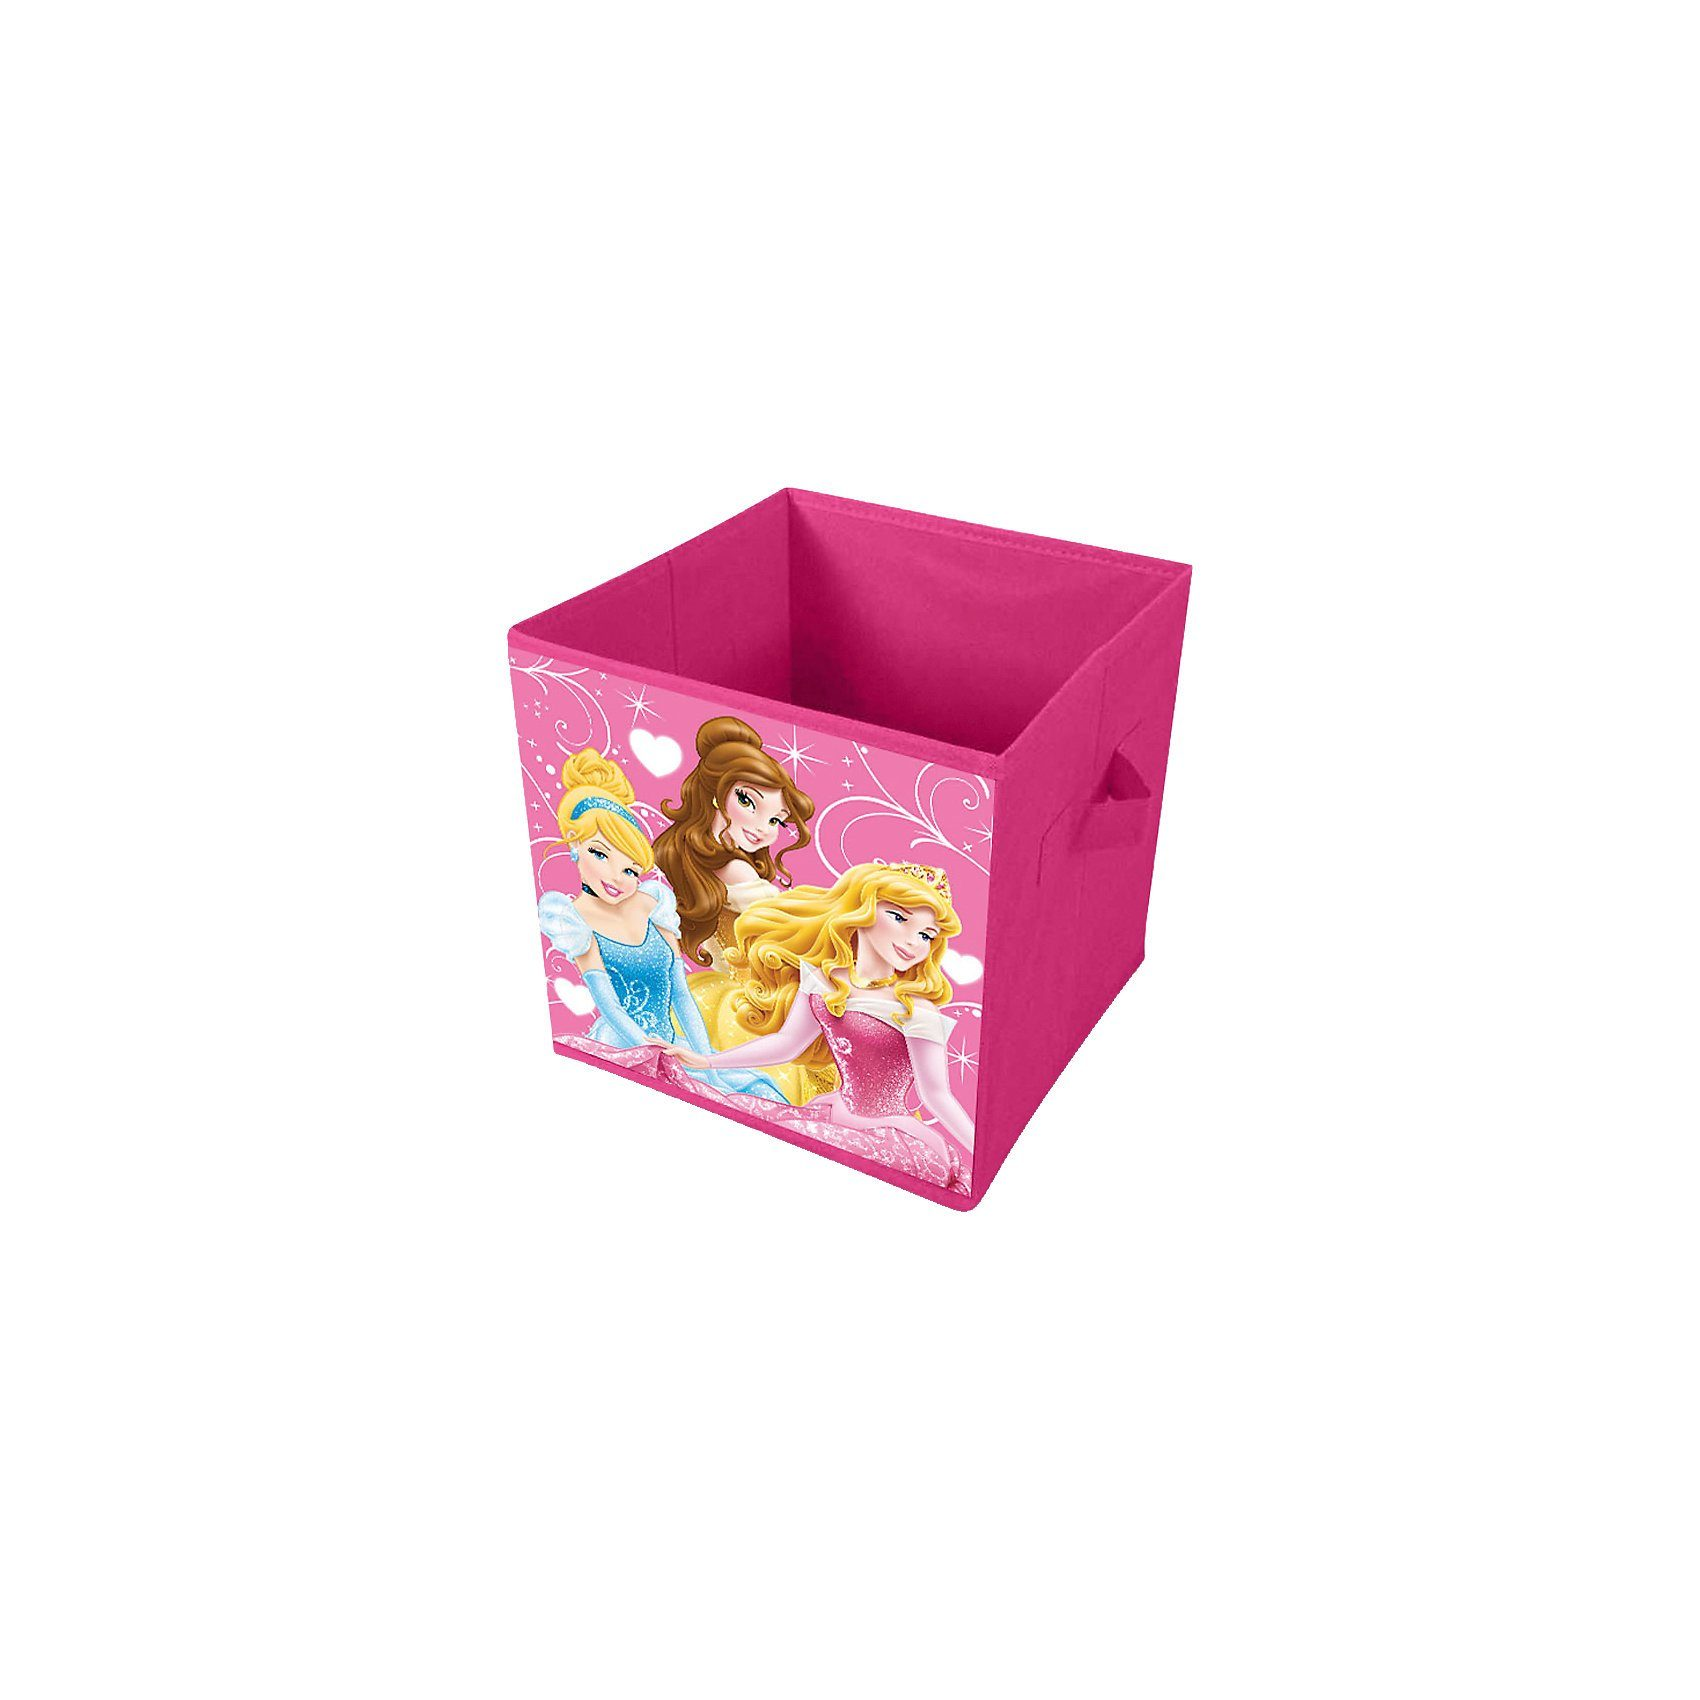 Faltbox Disney Princess, 28 x 28 cm